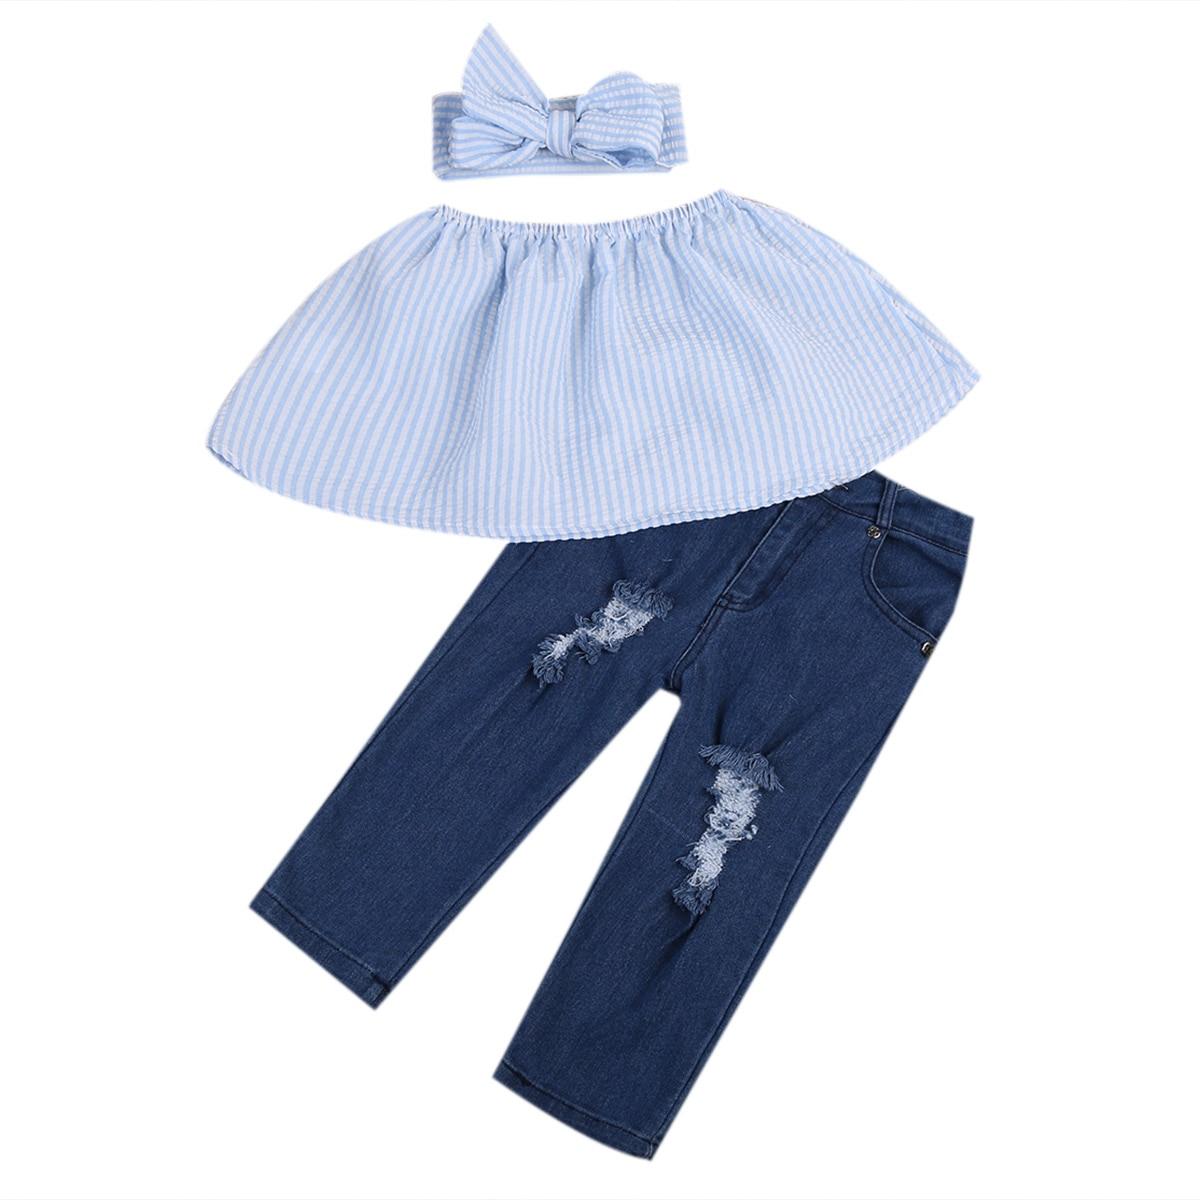 Summer 2017 Fashion Kids Girls Clothing Set Striped Crop Tops Tank+Hole Jean Denim Pant Headband Outfits Children Clothing 1-7Y